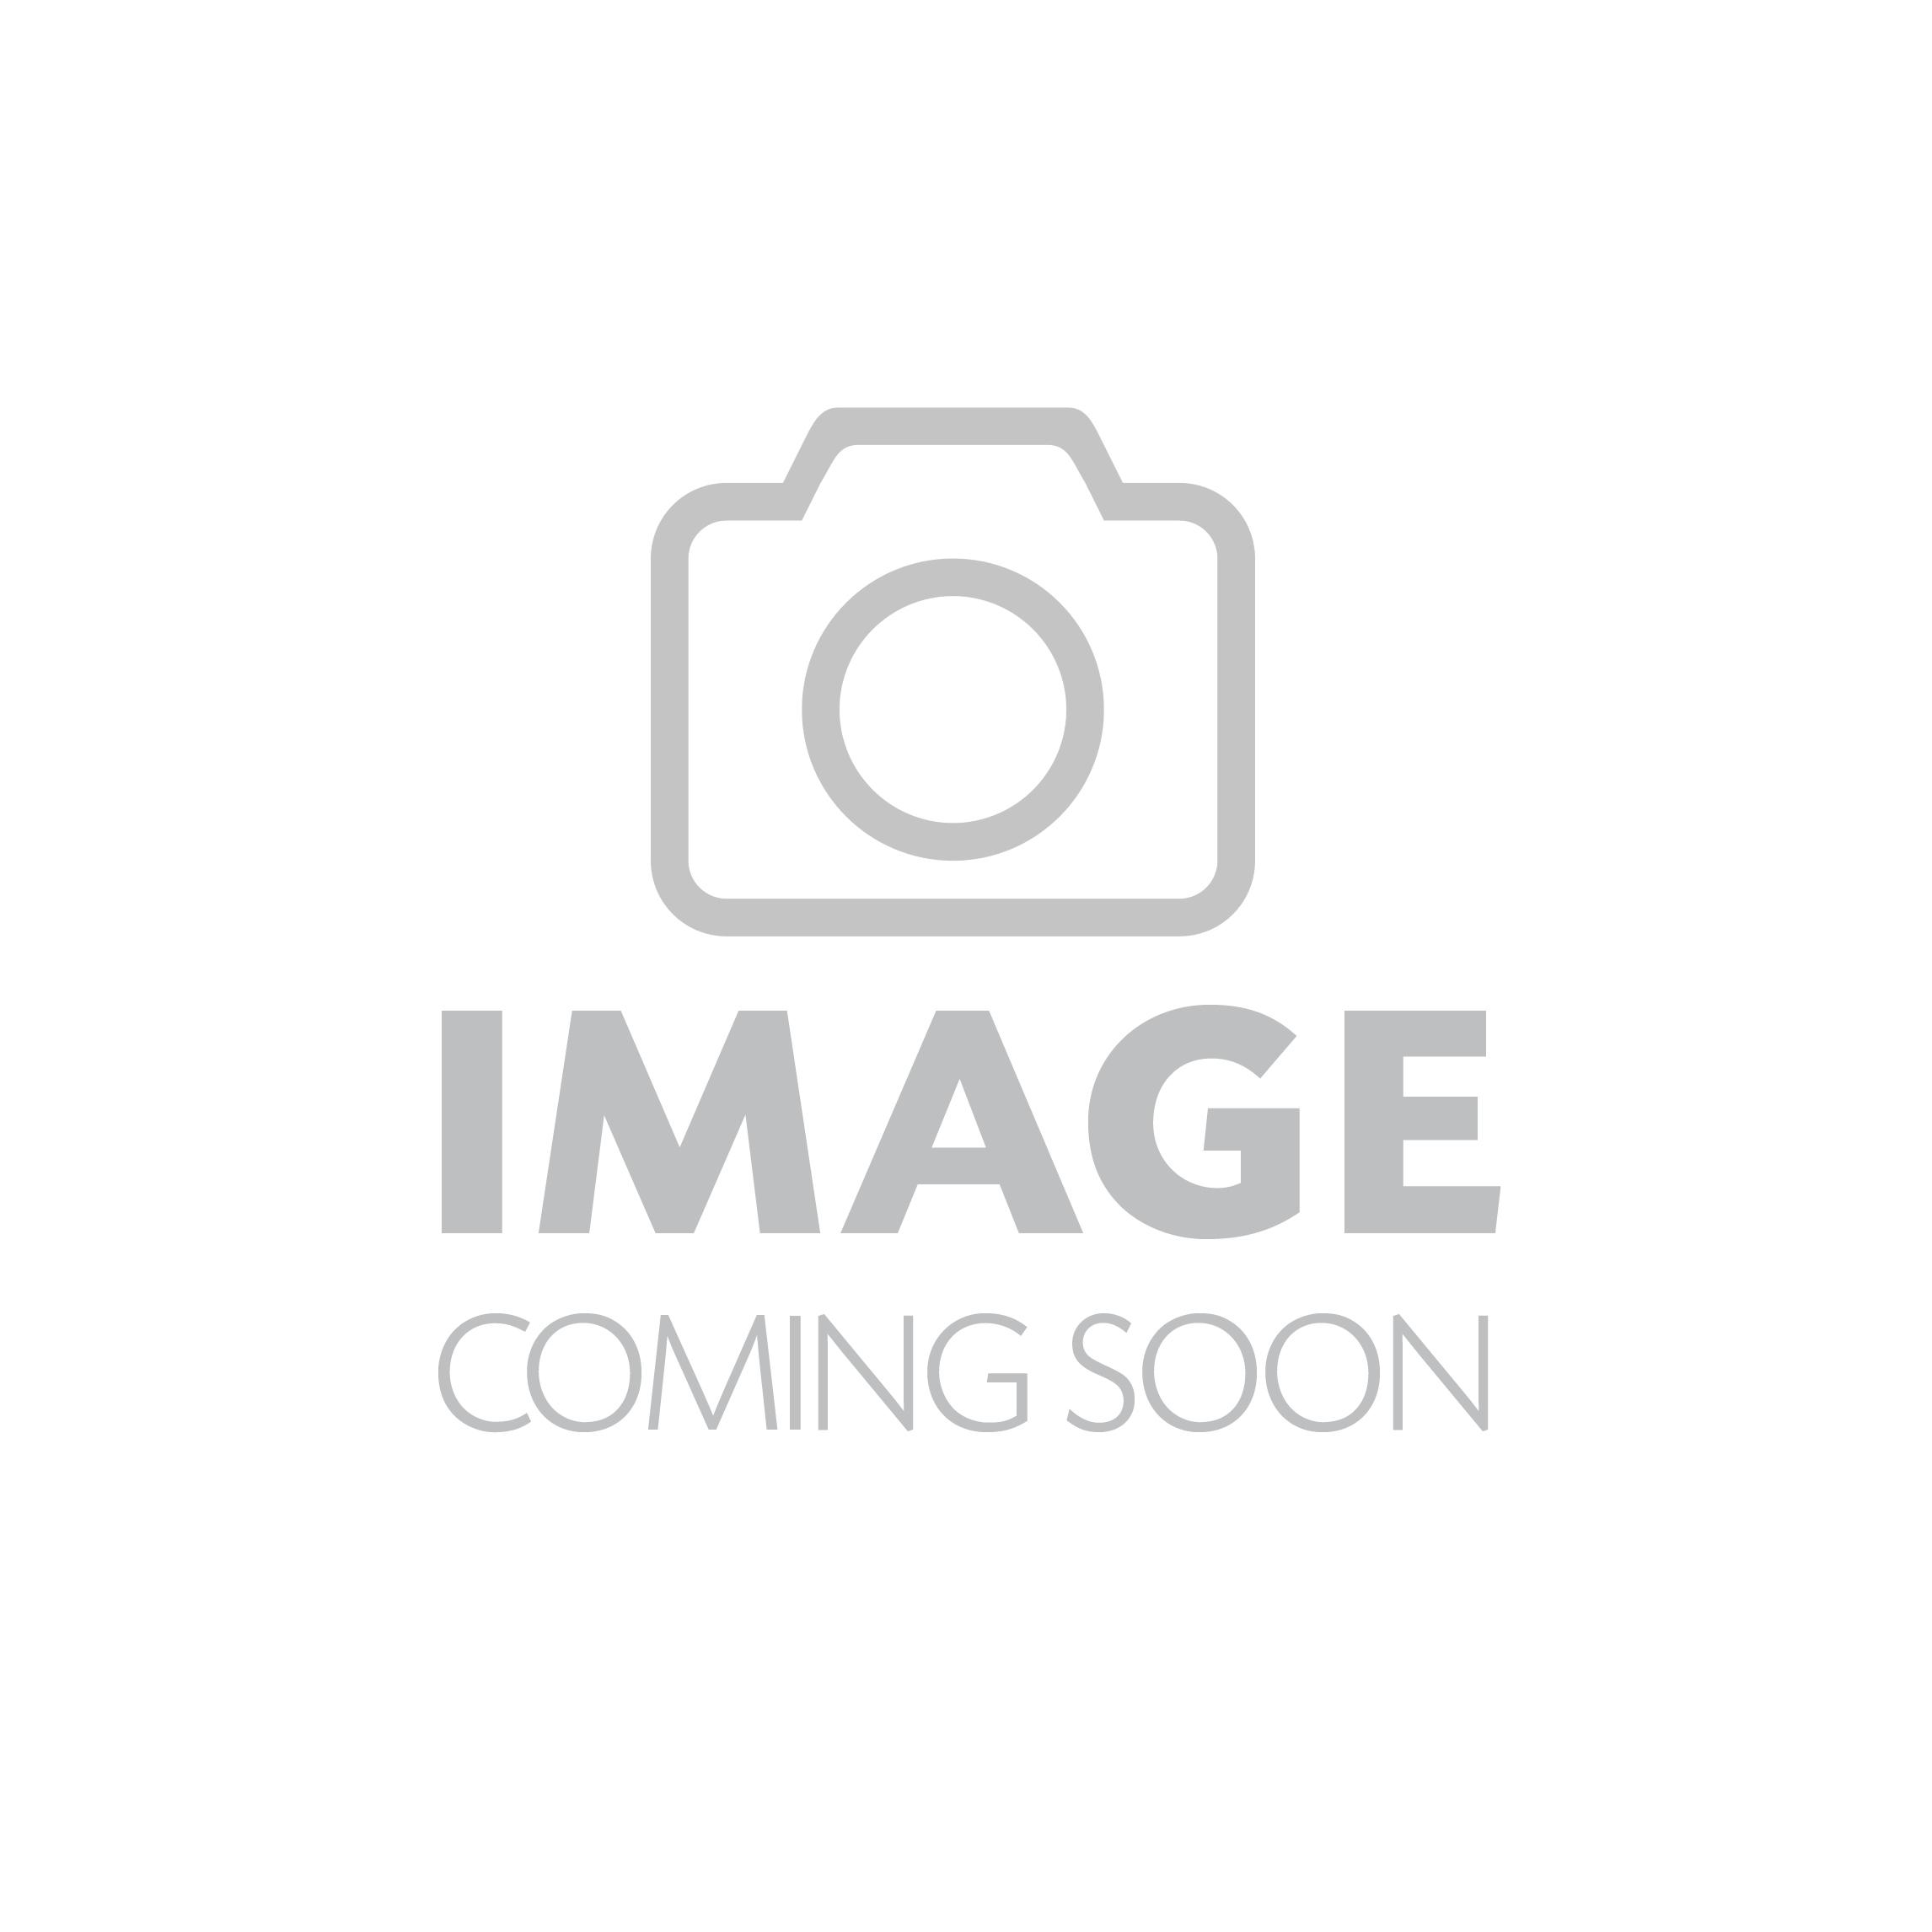 Kingspan Titan AT70 Cold Water Storage Water Tank